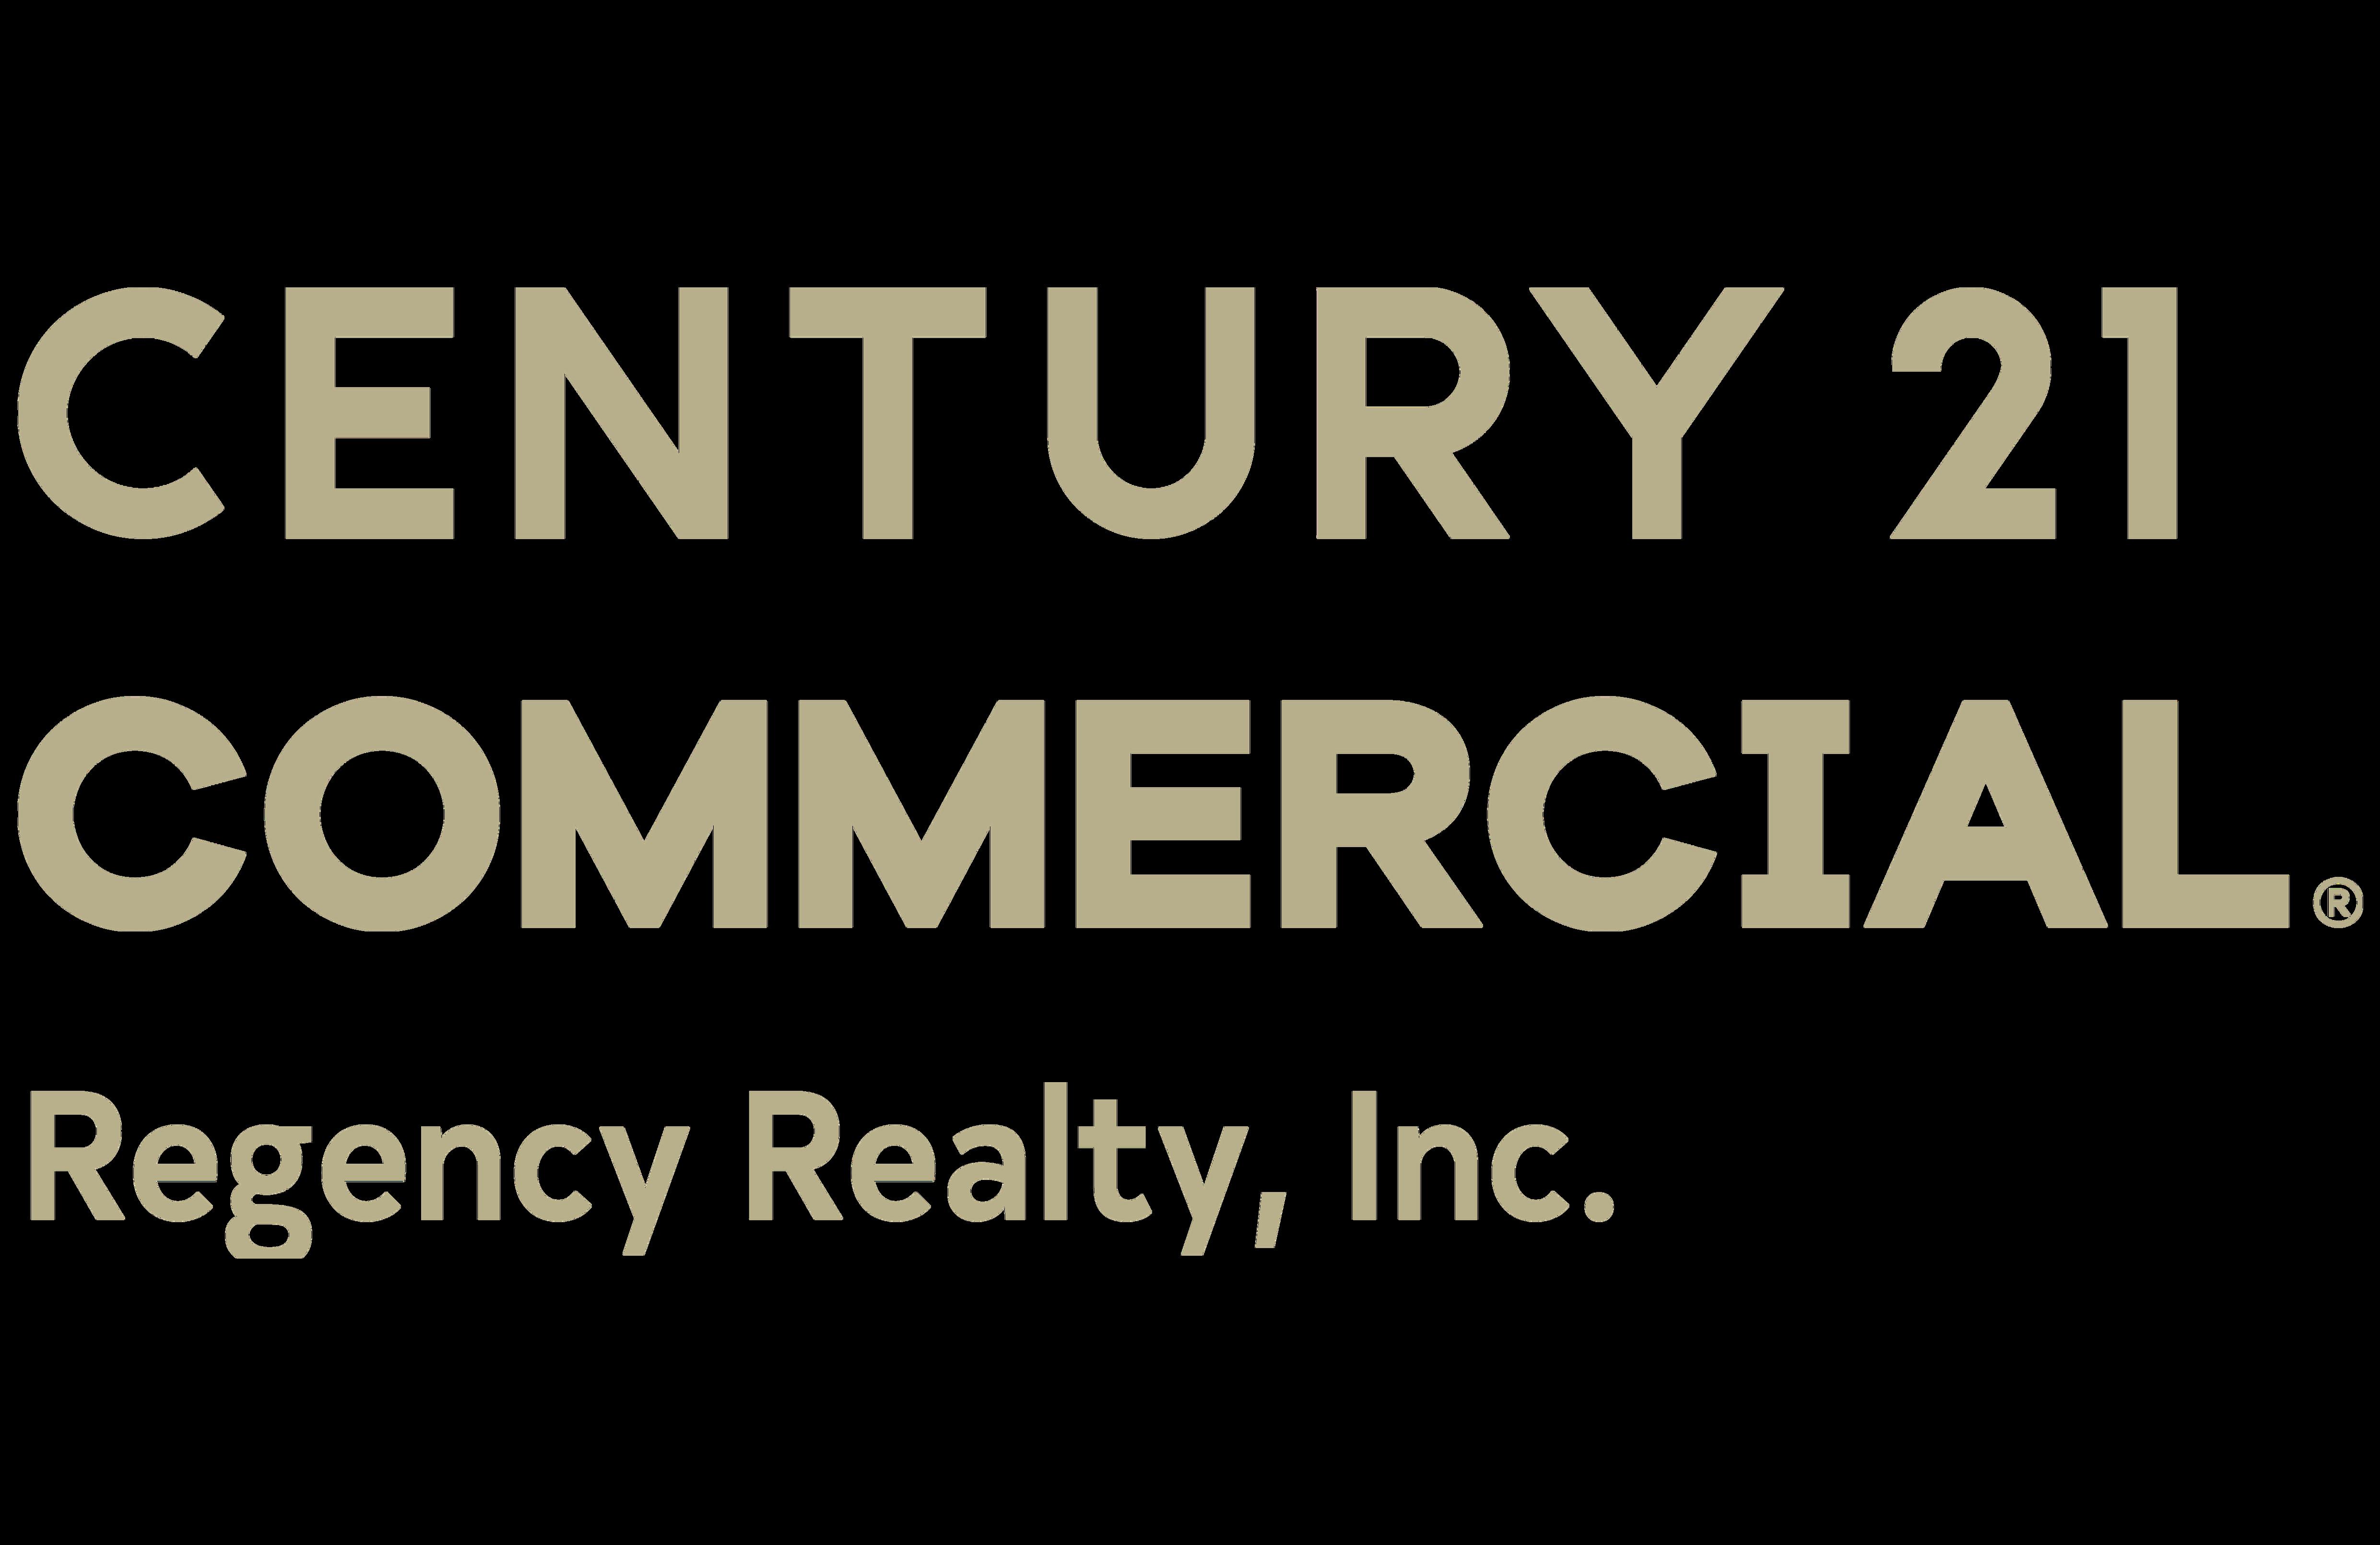 CENTURY 21 Regency Realty, Inc.